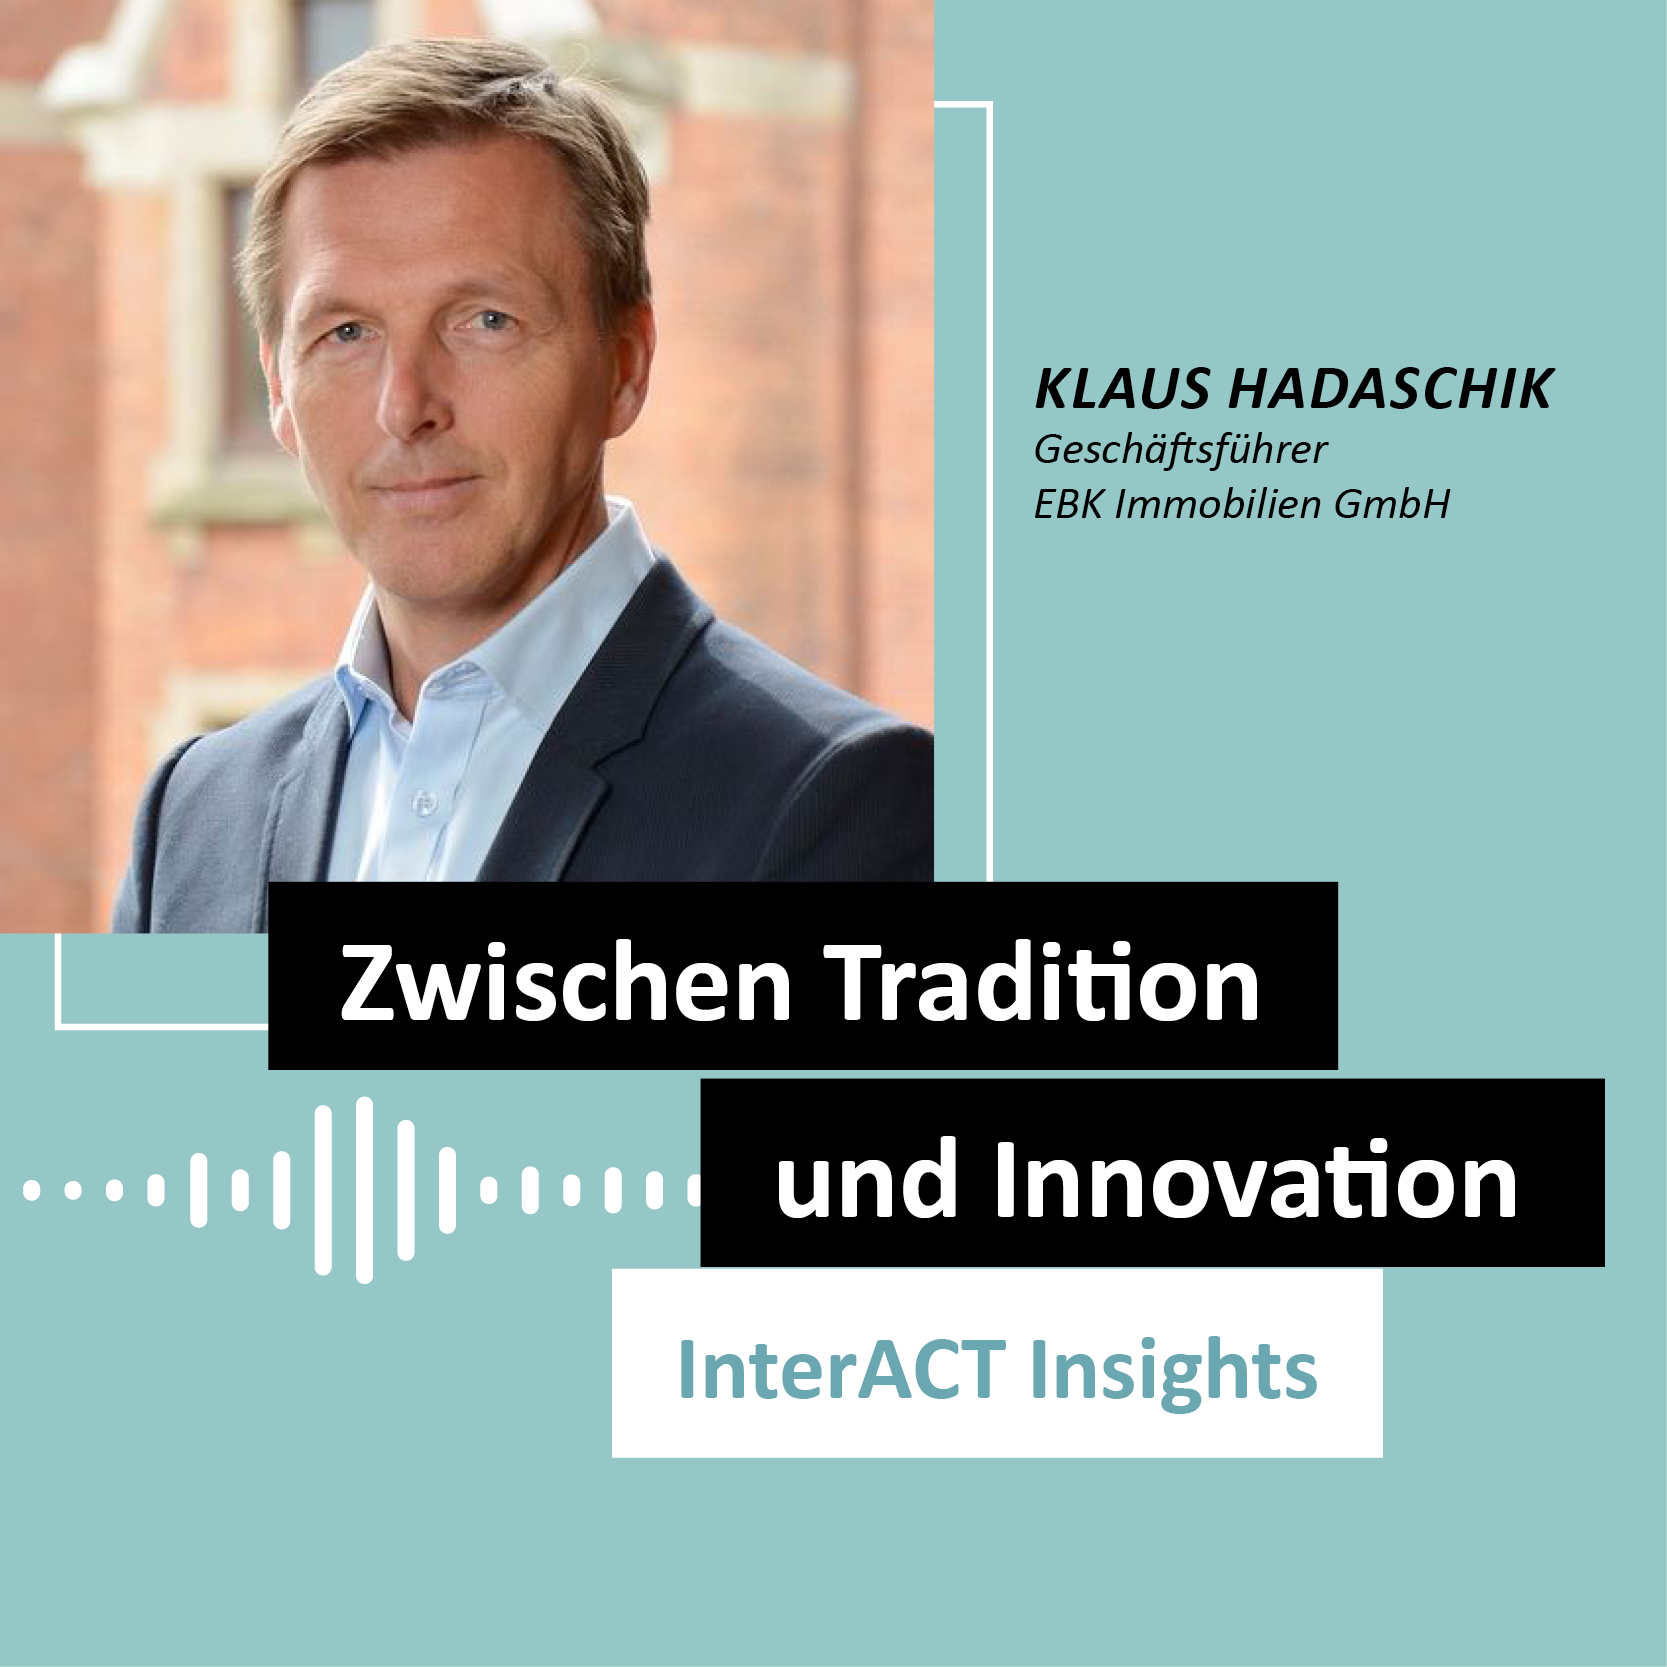 Klaus Hadaschik